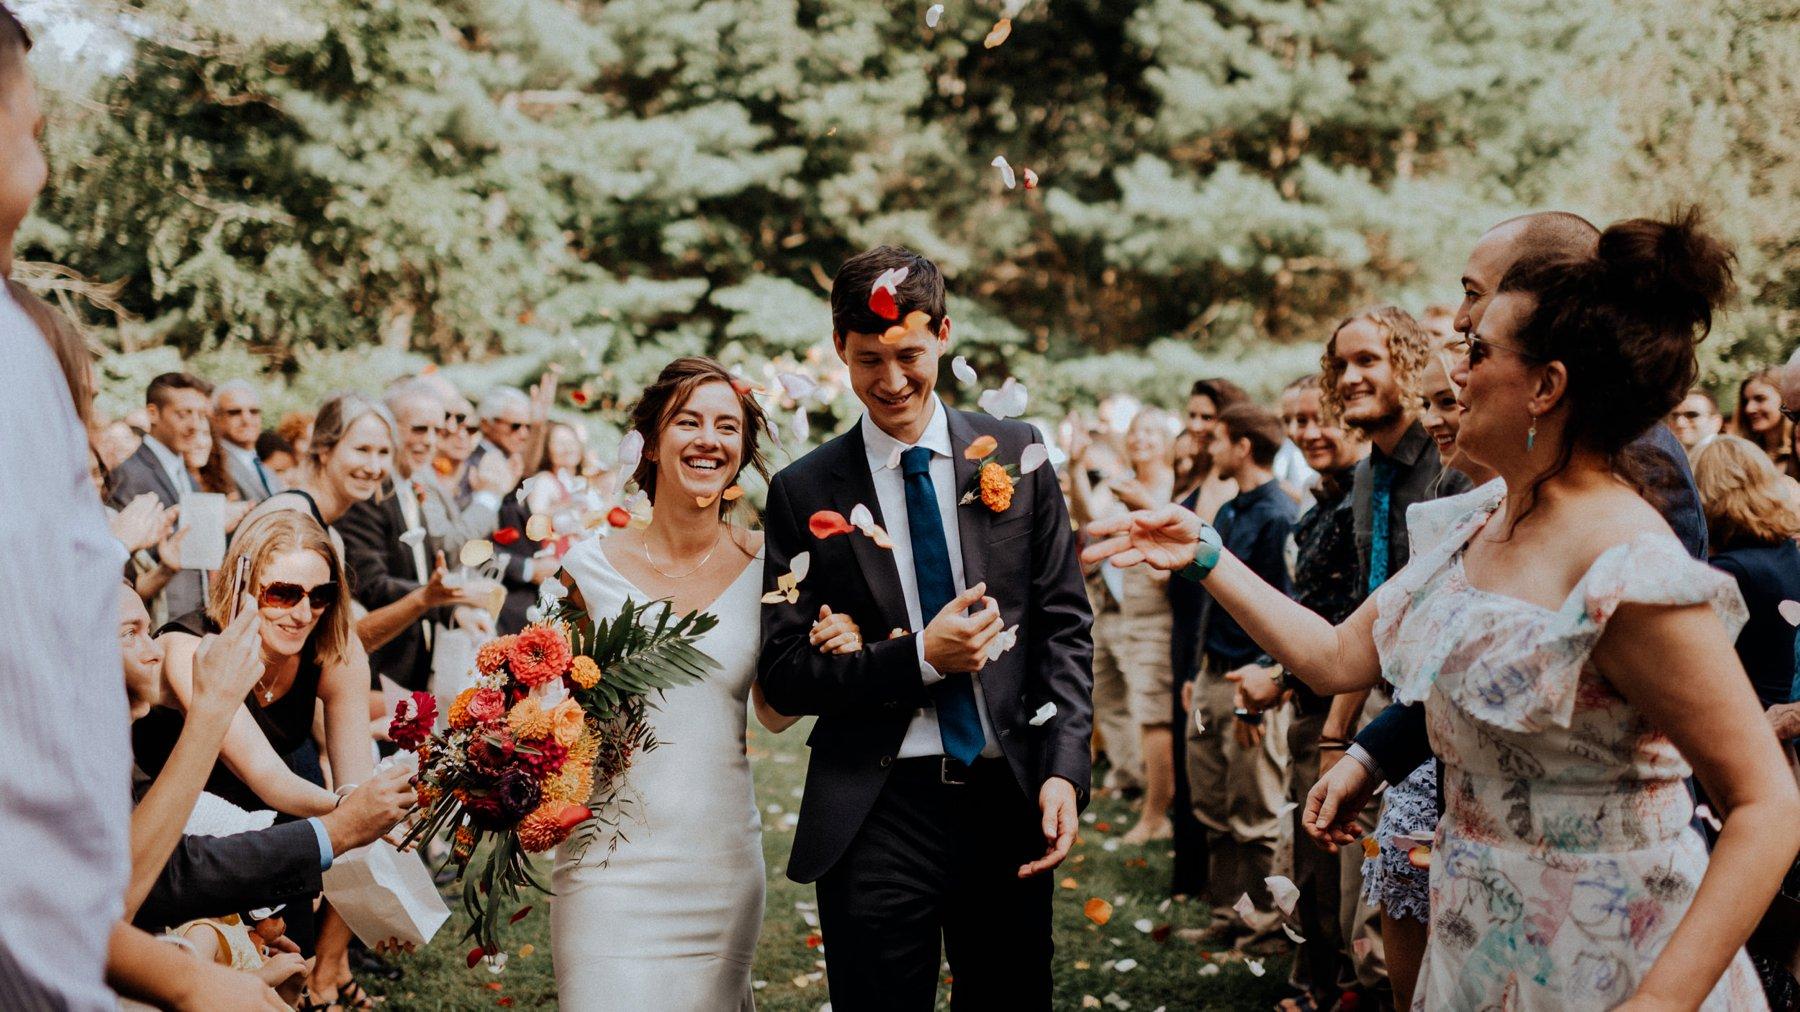 150-144-private-estate-wedding-12.jpg